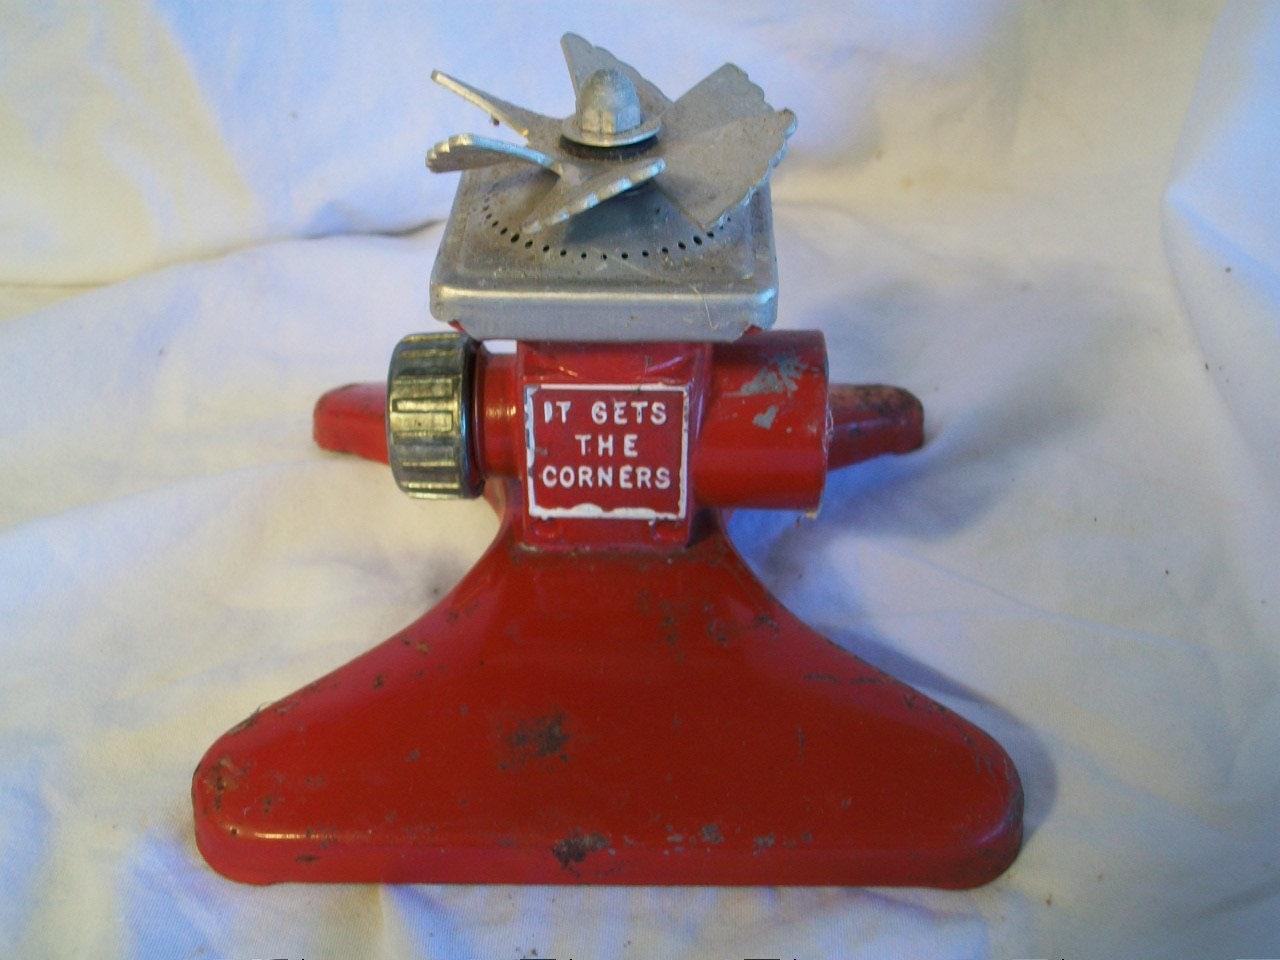 it gets the corners rotating sprinkler vintage etsy